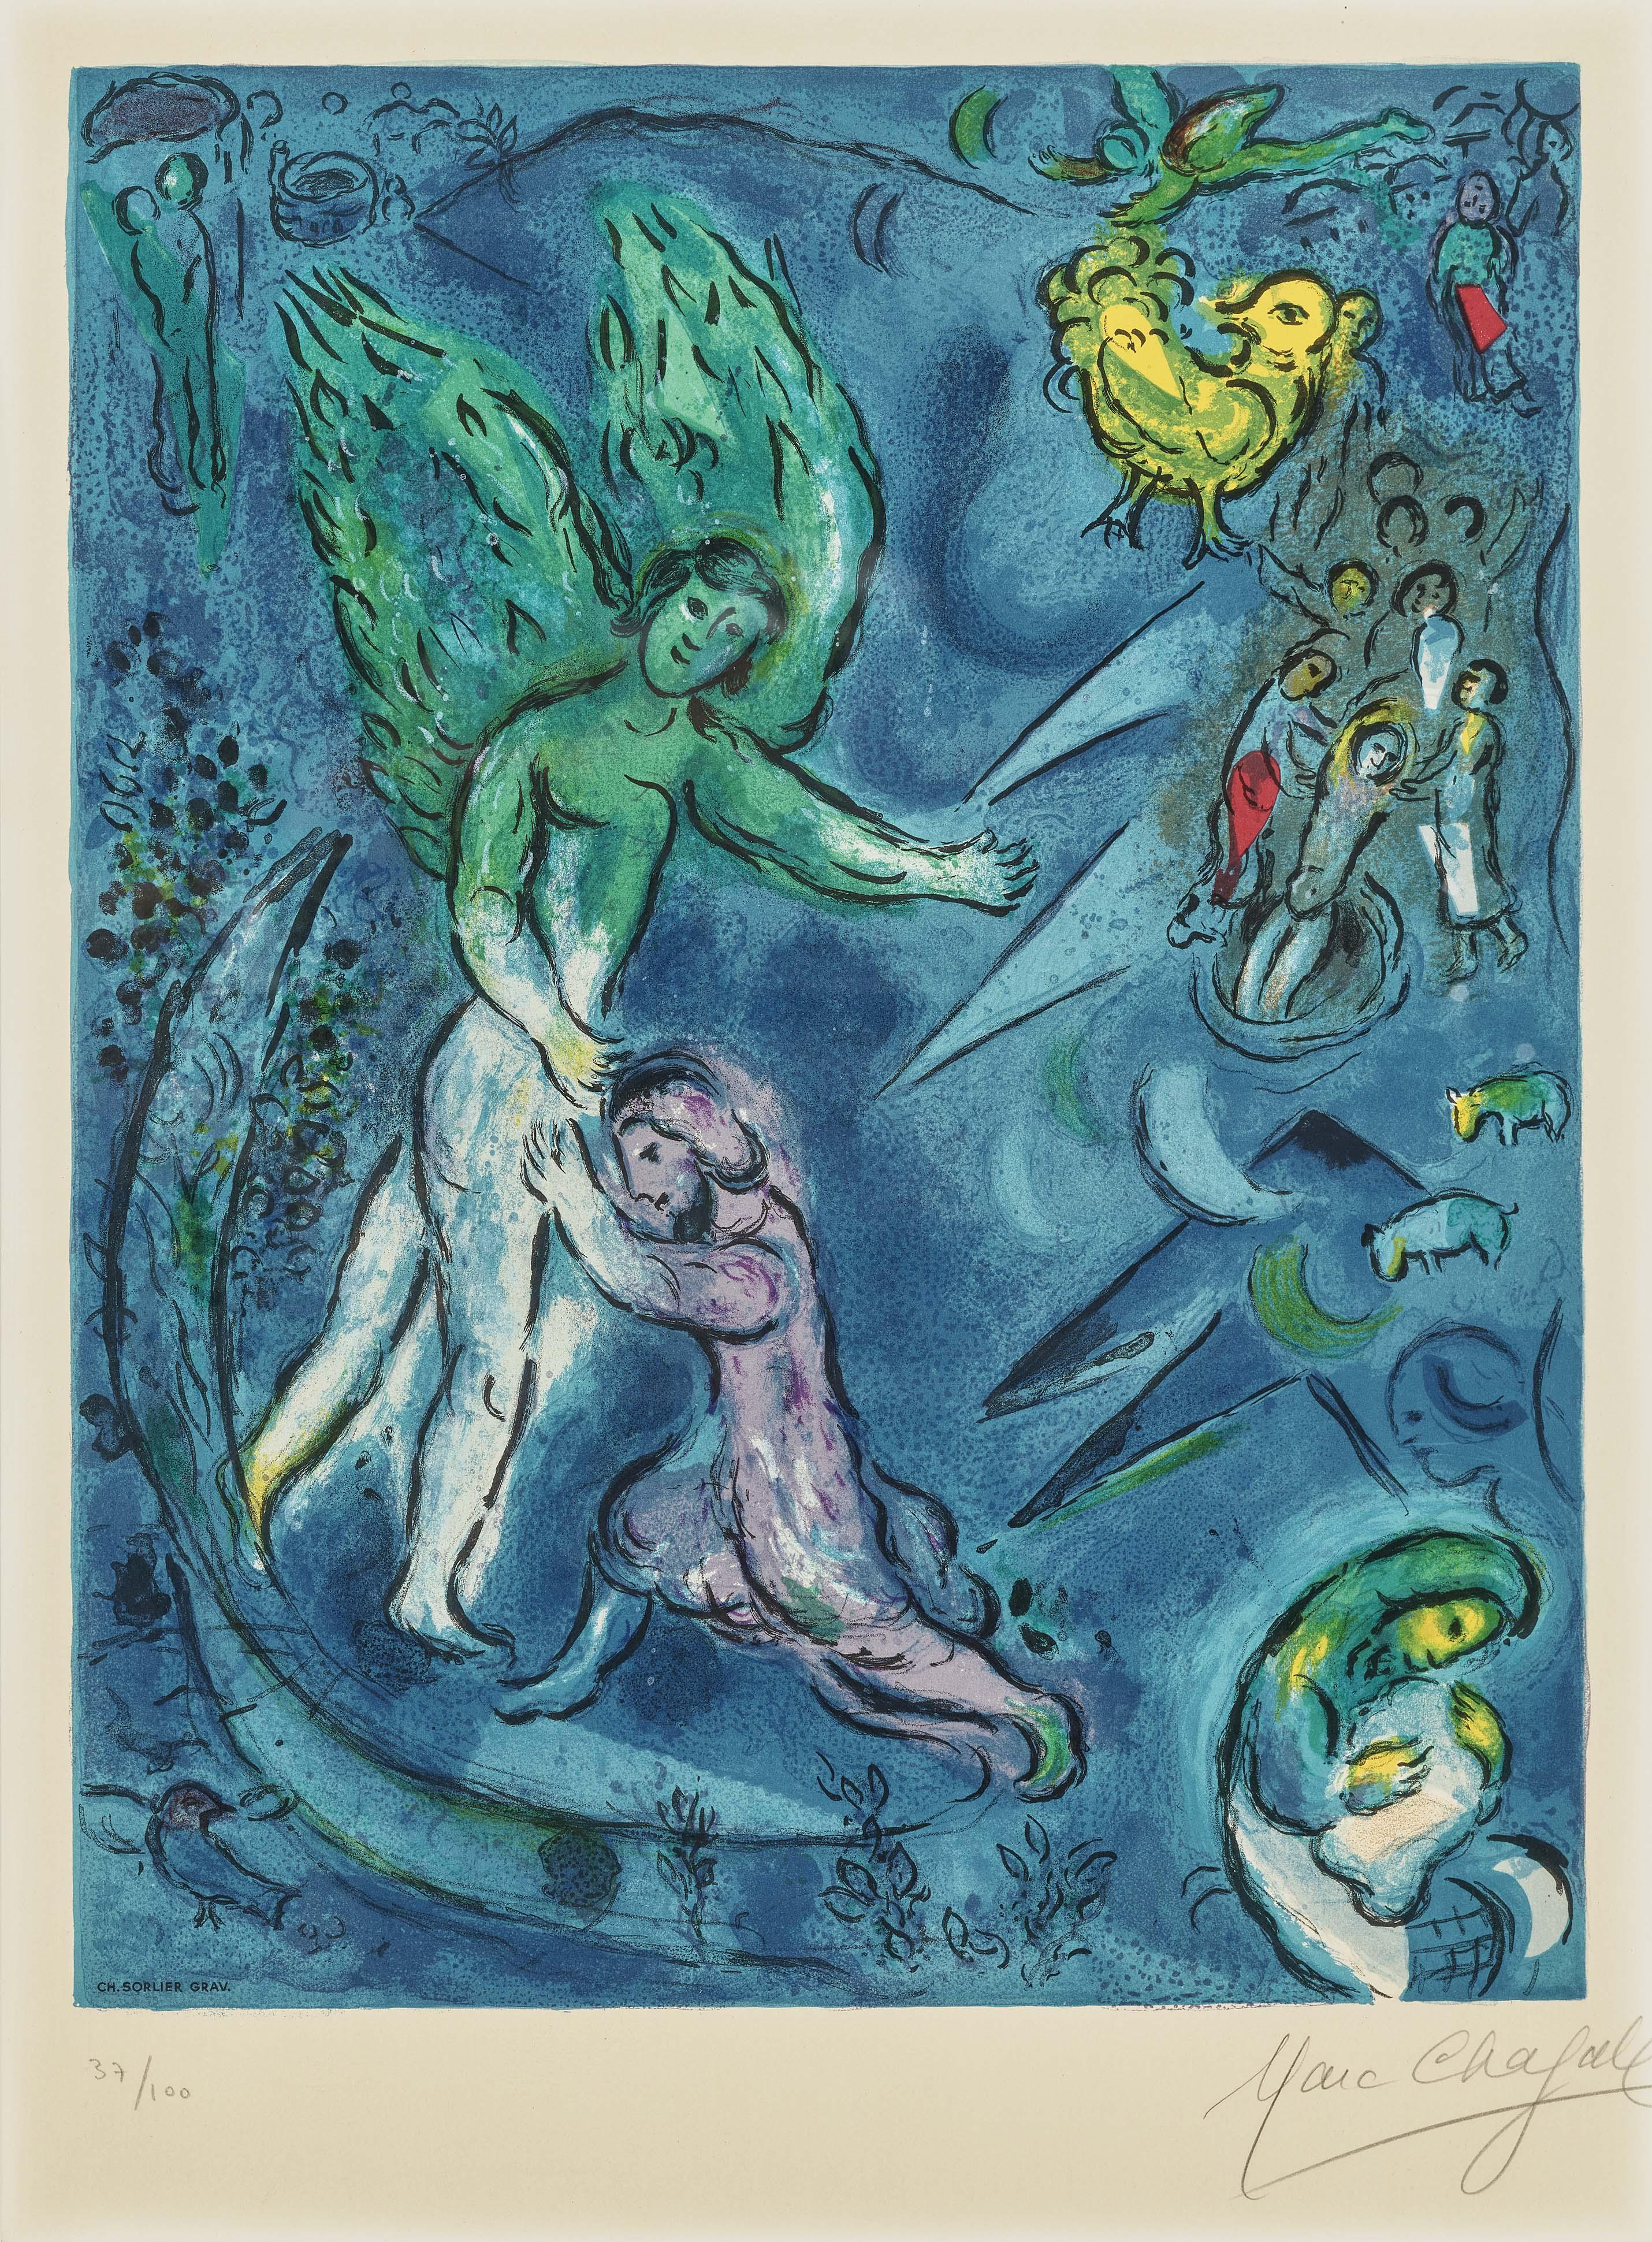 Marc Chagall - Der Kampf Jacobs Mit Dem Engel. 1967